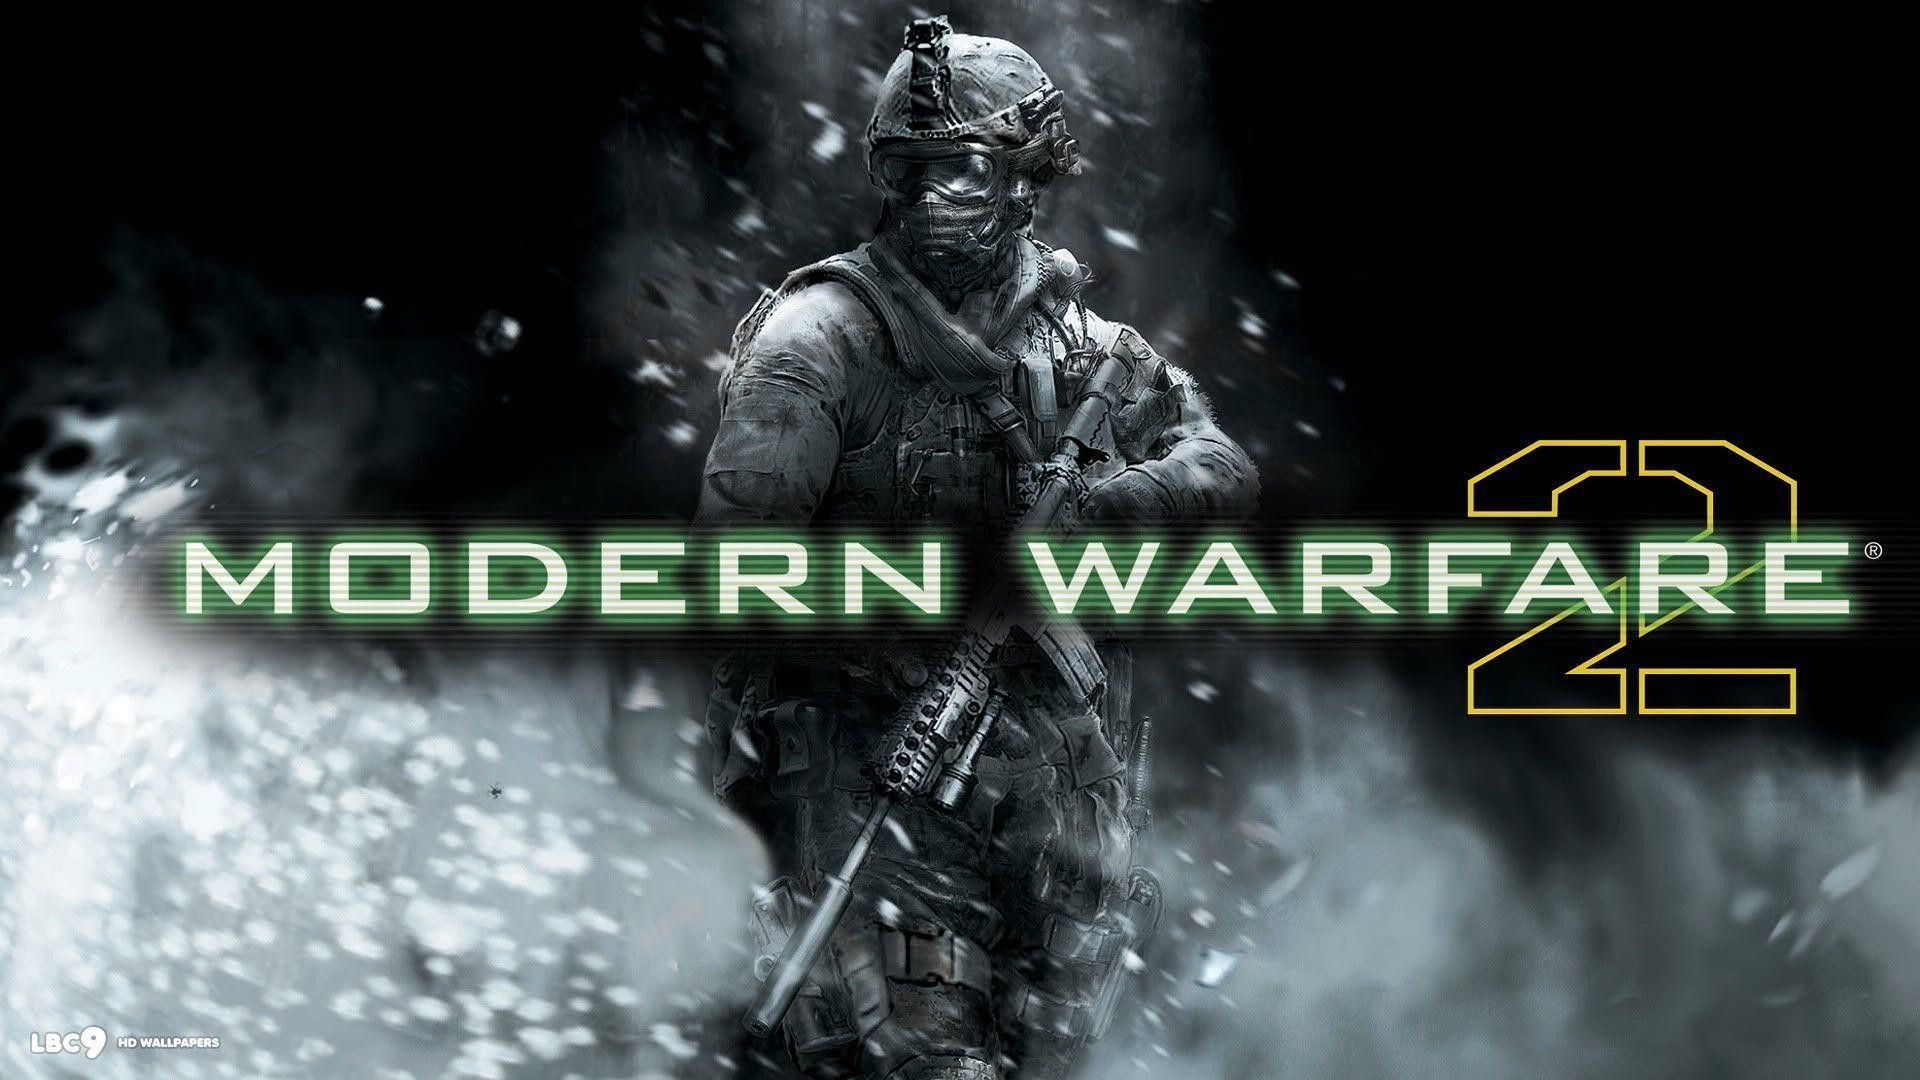 1920x1080 Call Of Duty Modern Warfare 2 Wallpaper 6 8